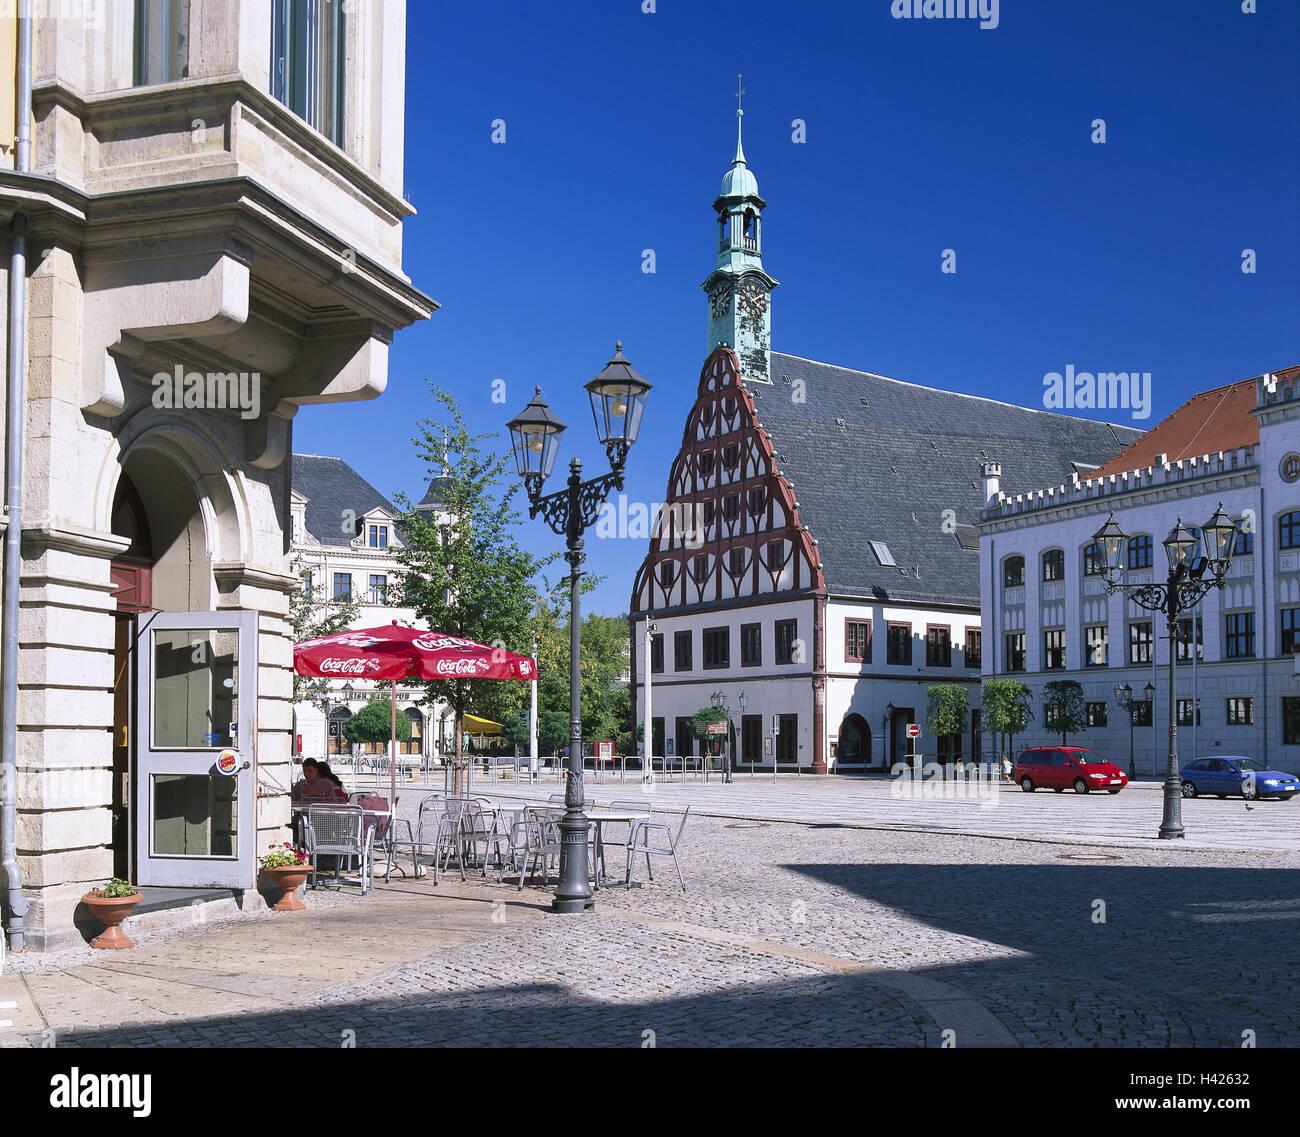 Markt.De Zwickau